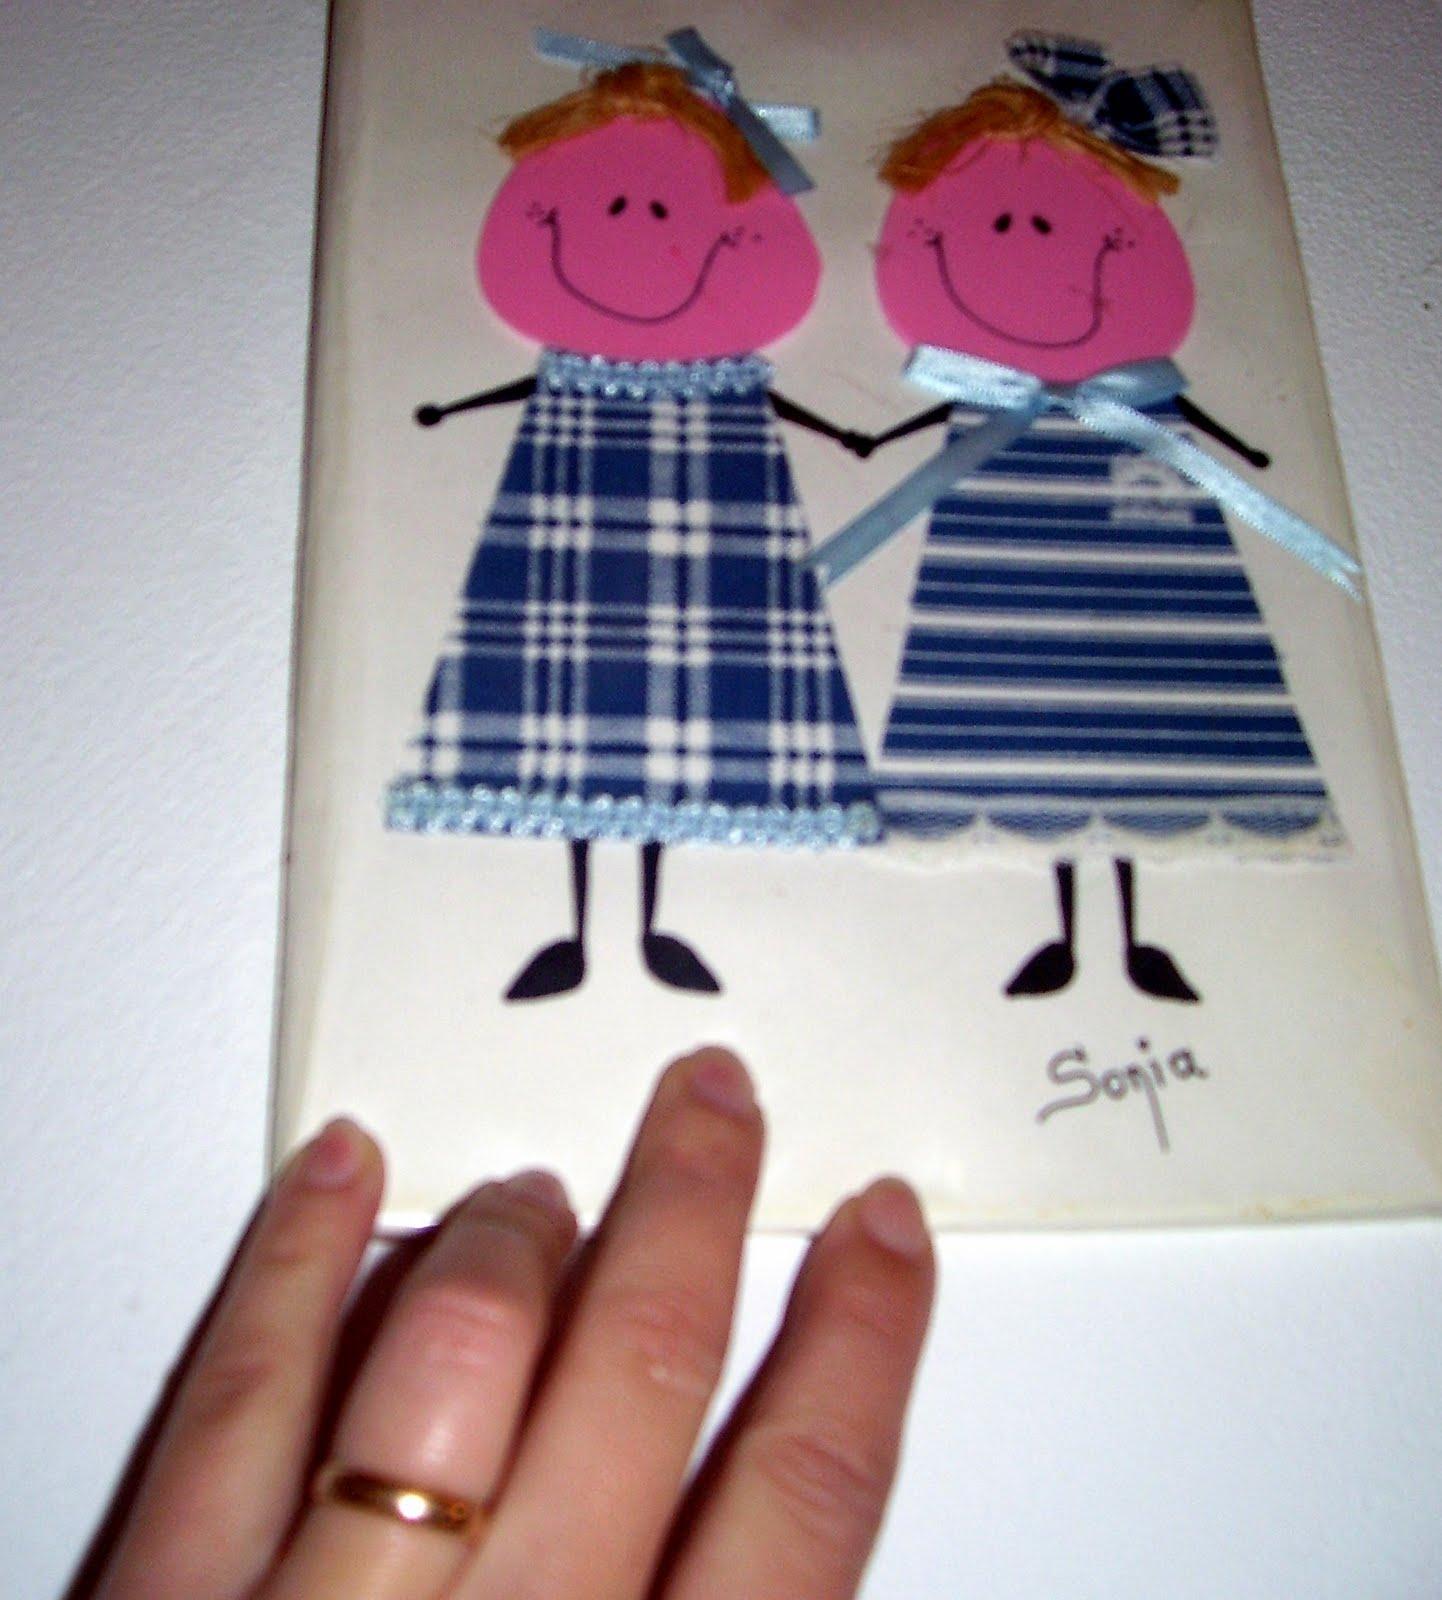 RECREAR - MANUALIDADES - ARTE: Cuaderno forrado con muñecas.